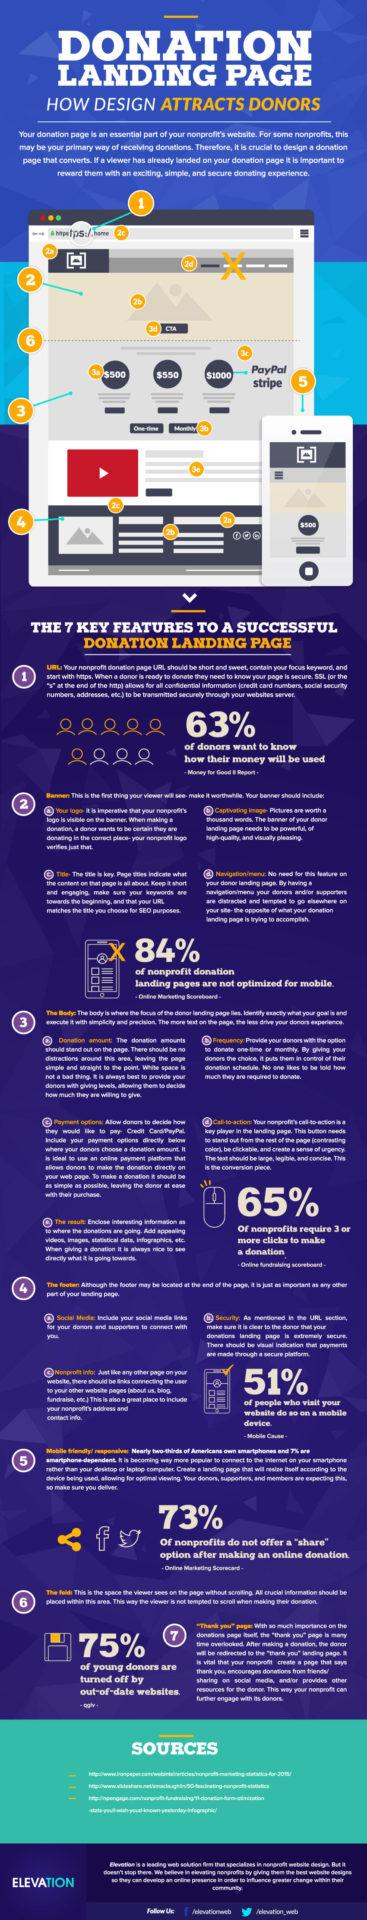 nonprofit-website-design-landing-page-infographic-elevation-1